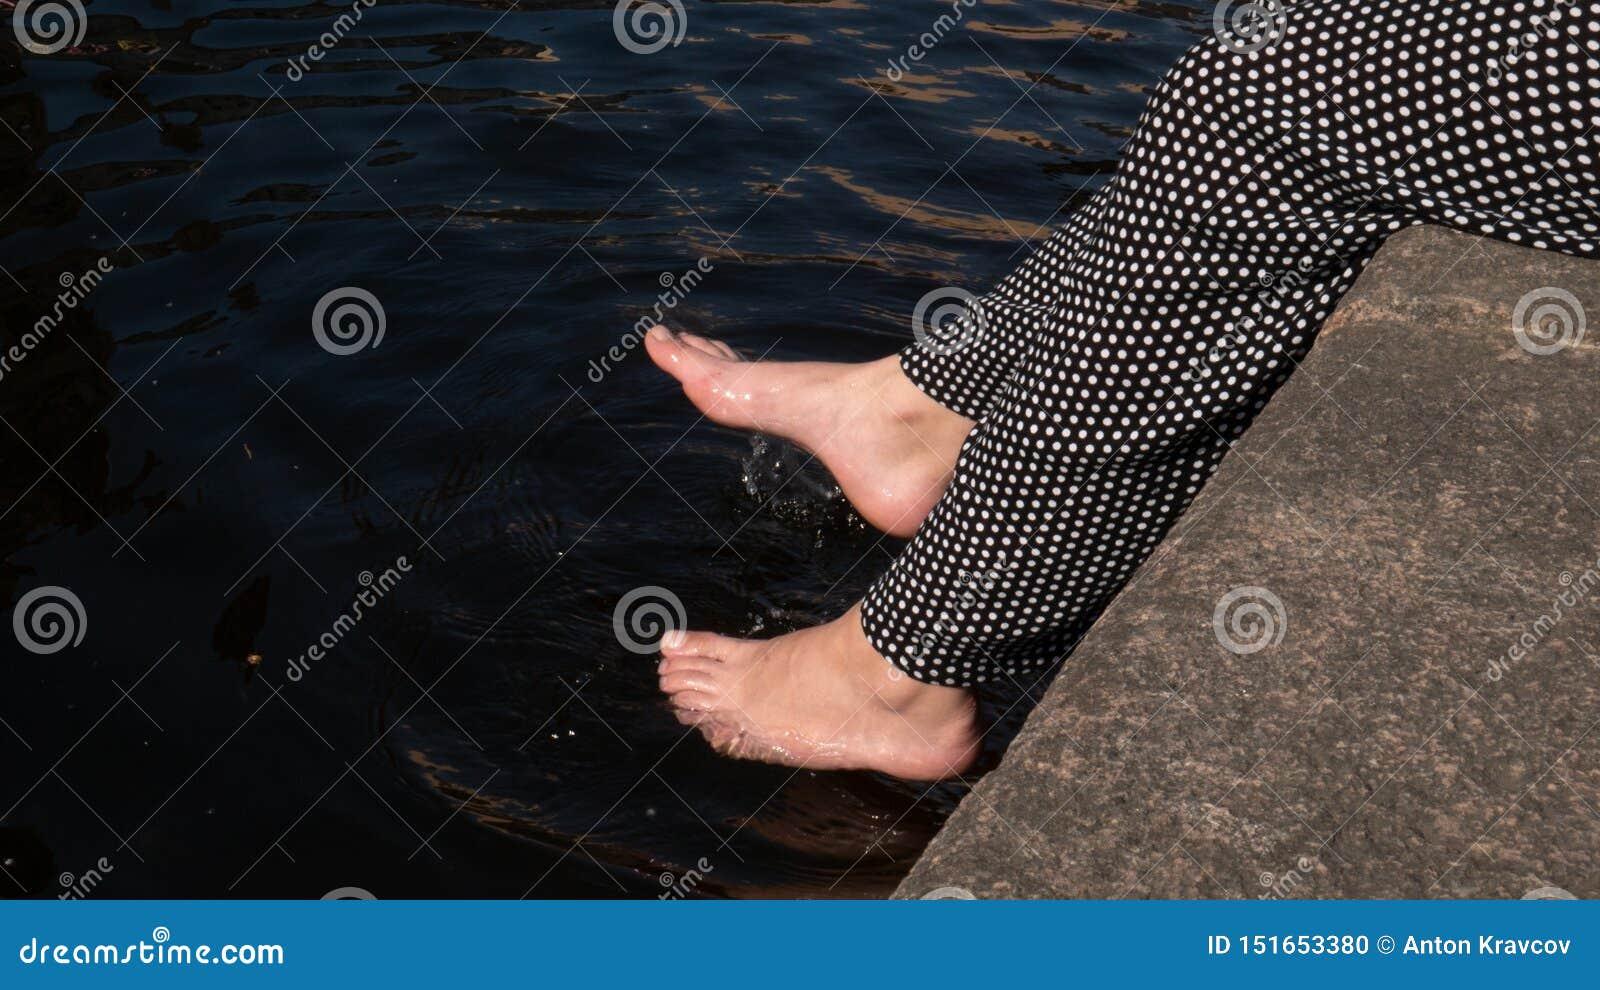 Kobiet nóg rzutu woda Kiść, pluśnięcie, lato nastrój